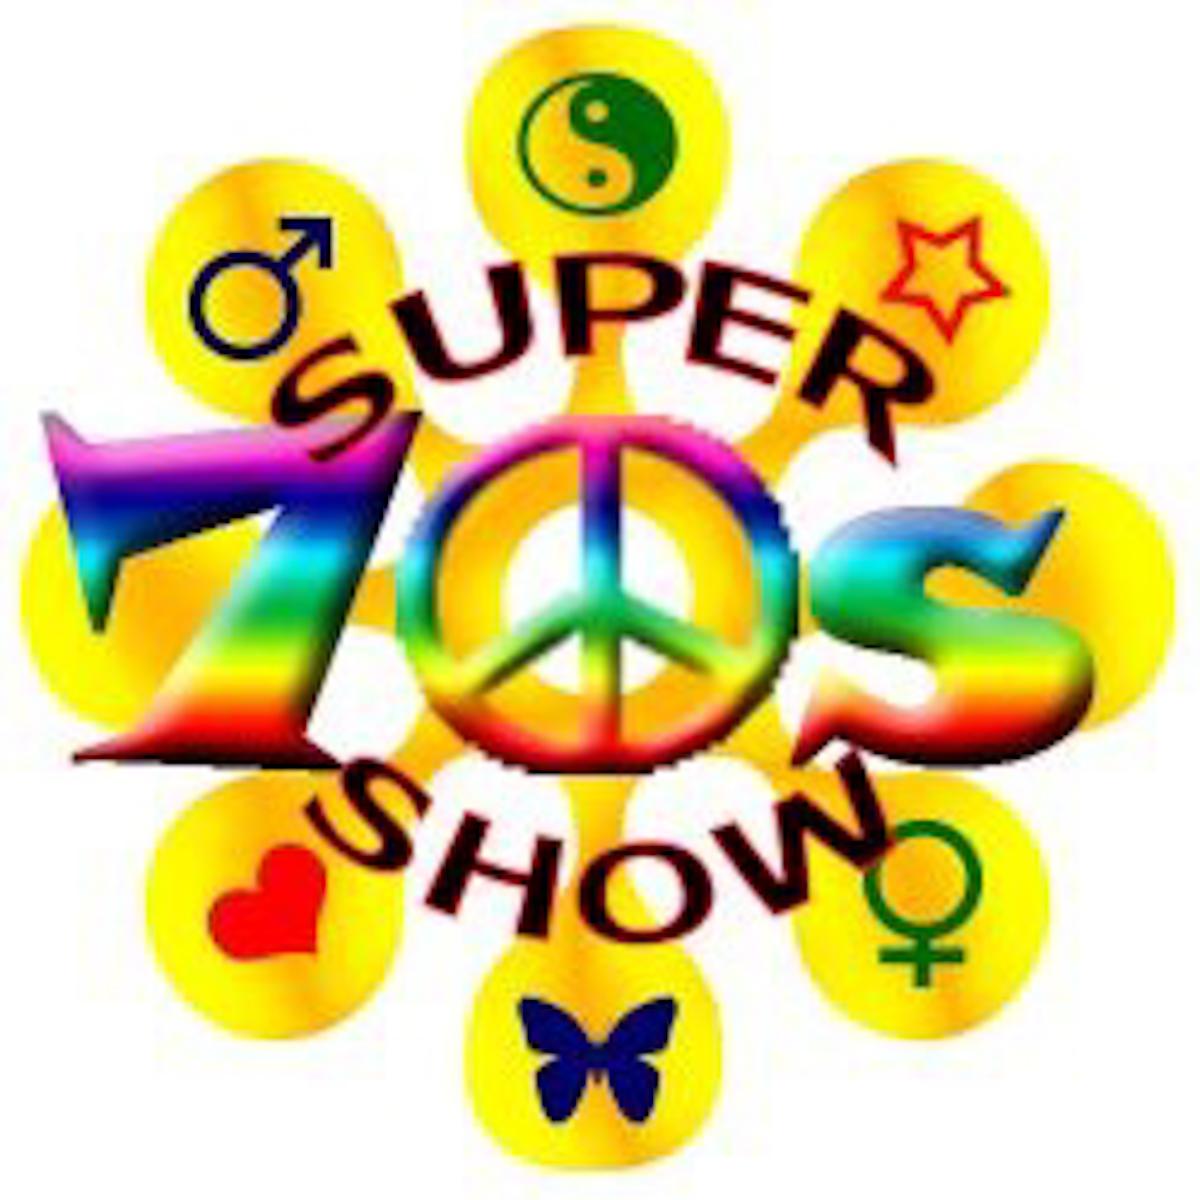 Super 70s